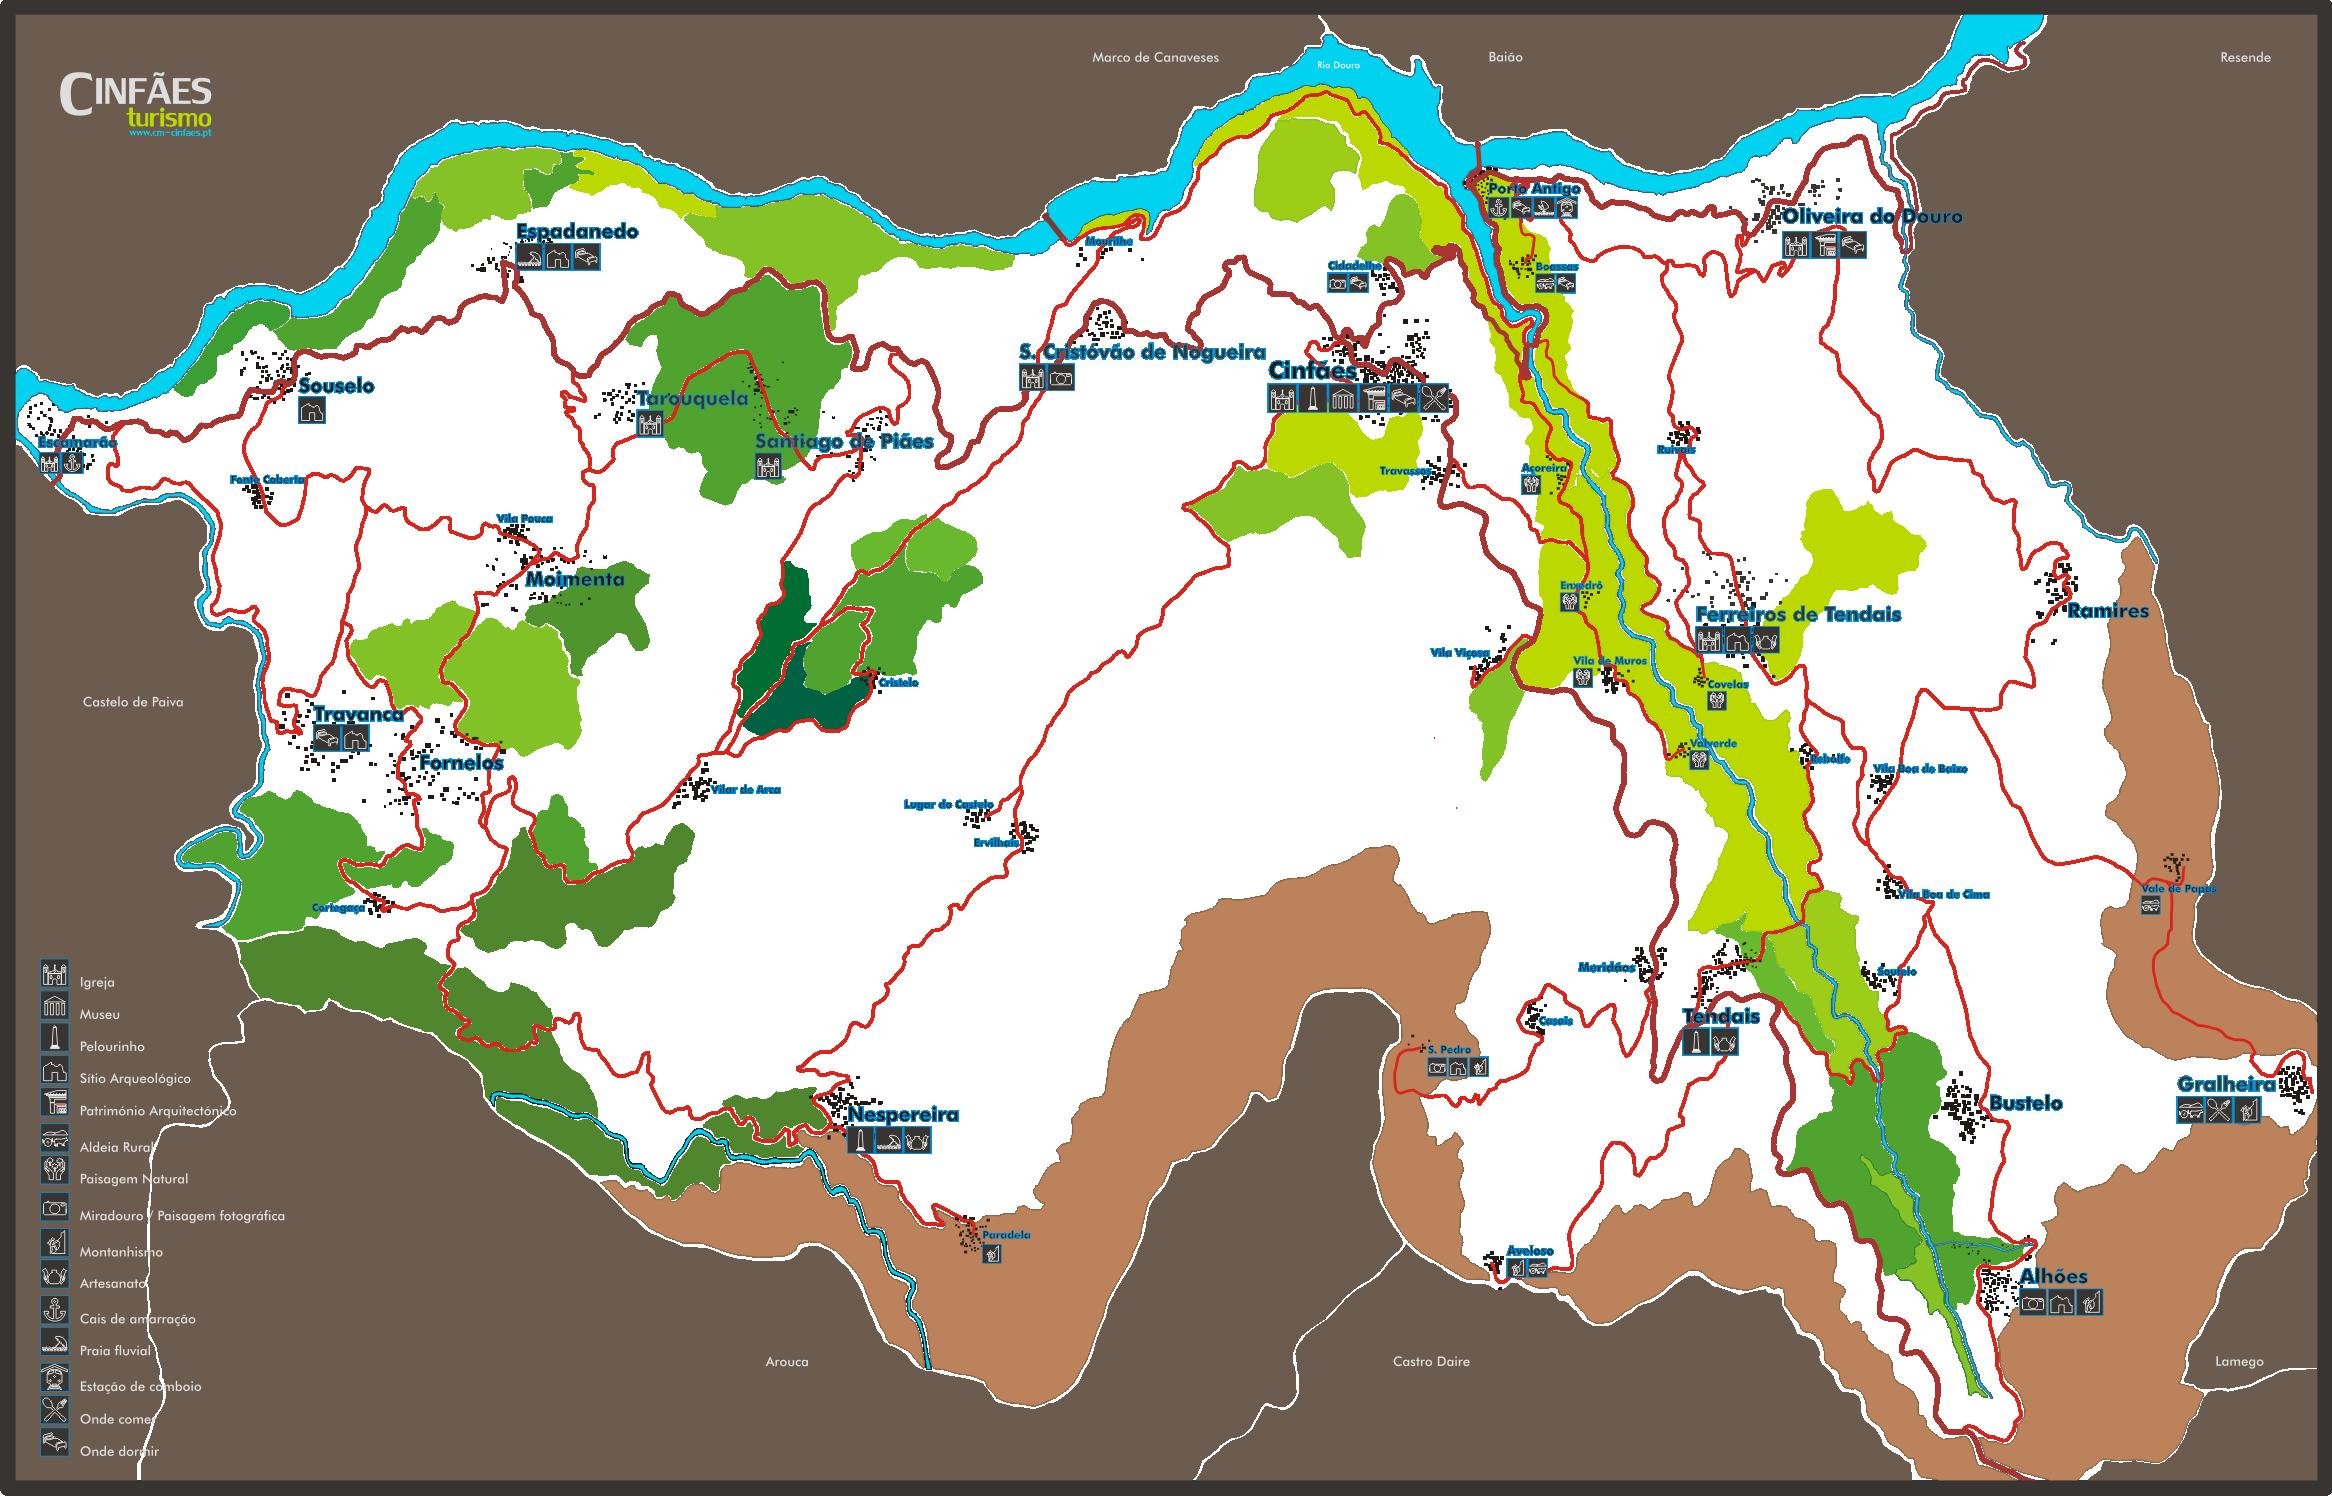 cinfães mapa Ficheiro:Mapa Cinfães.png – Wikipédia, a enciclopédia livre cinfães mapa